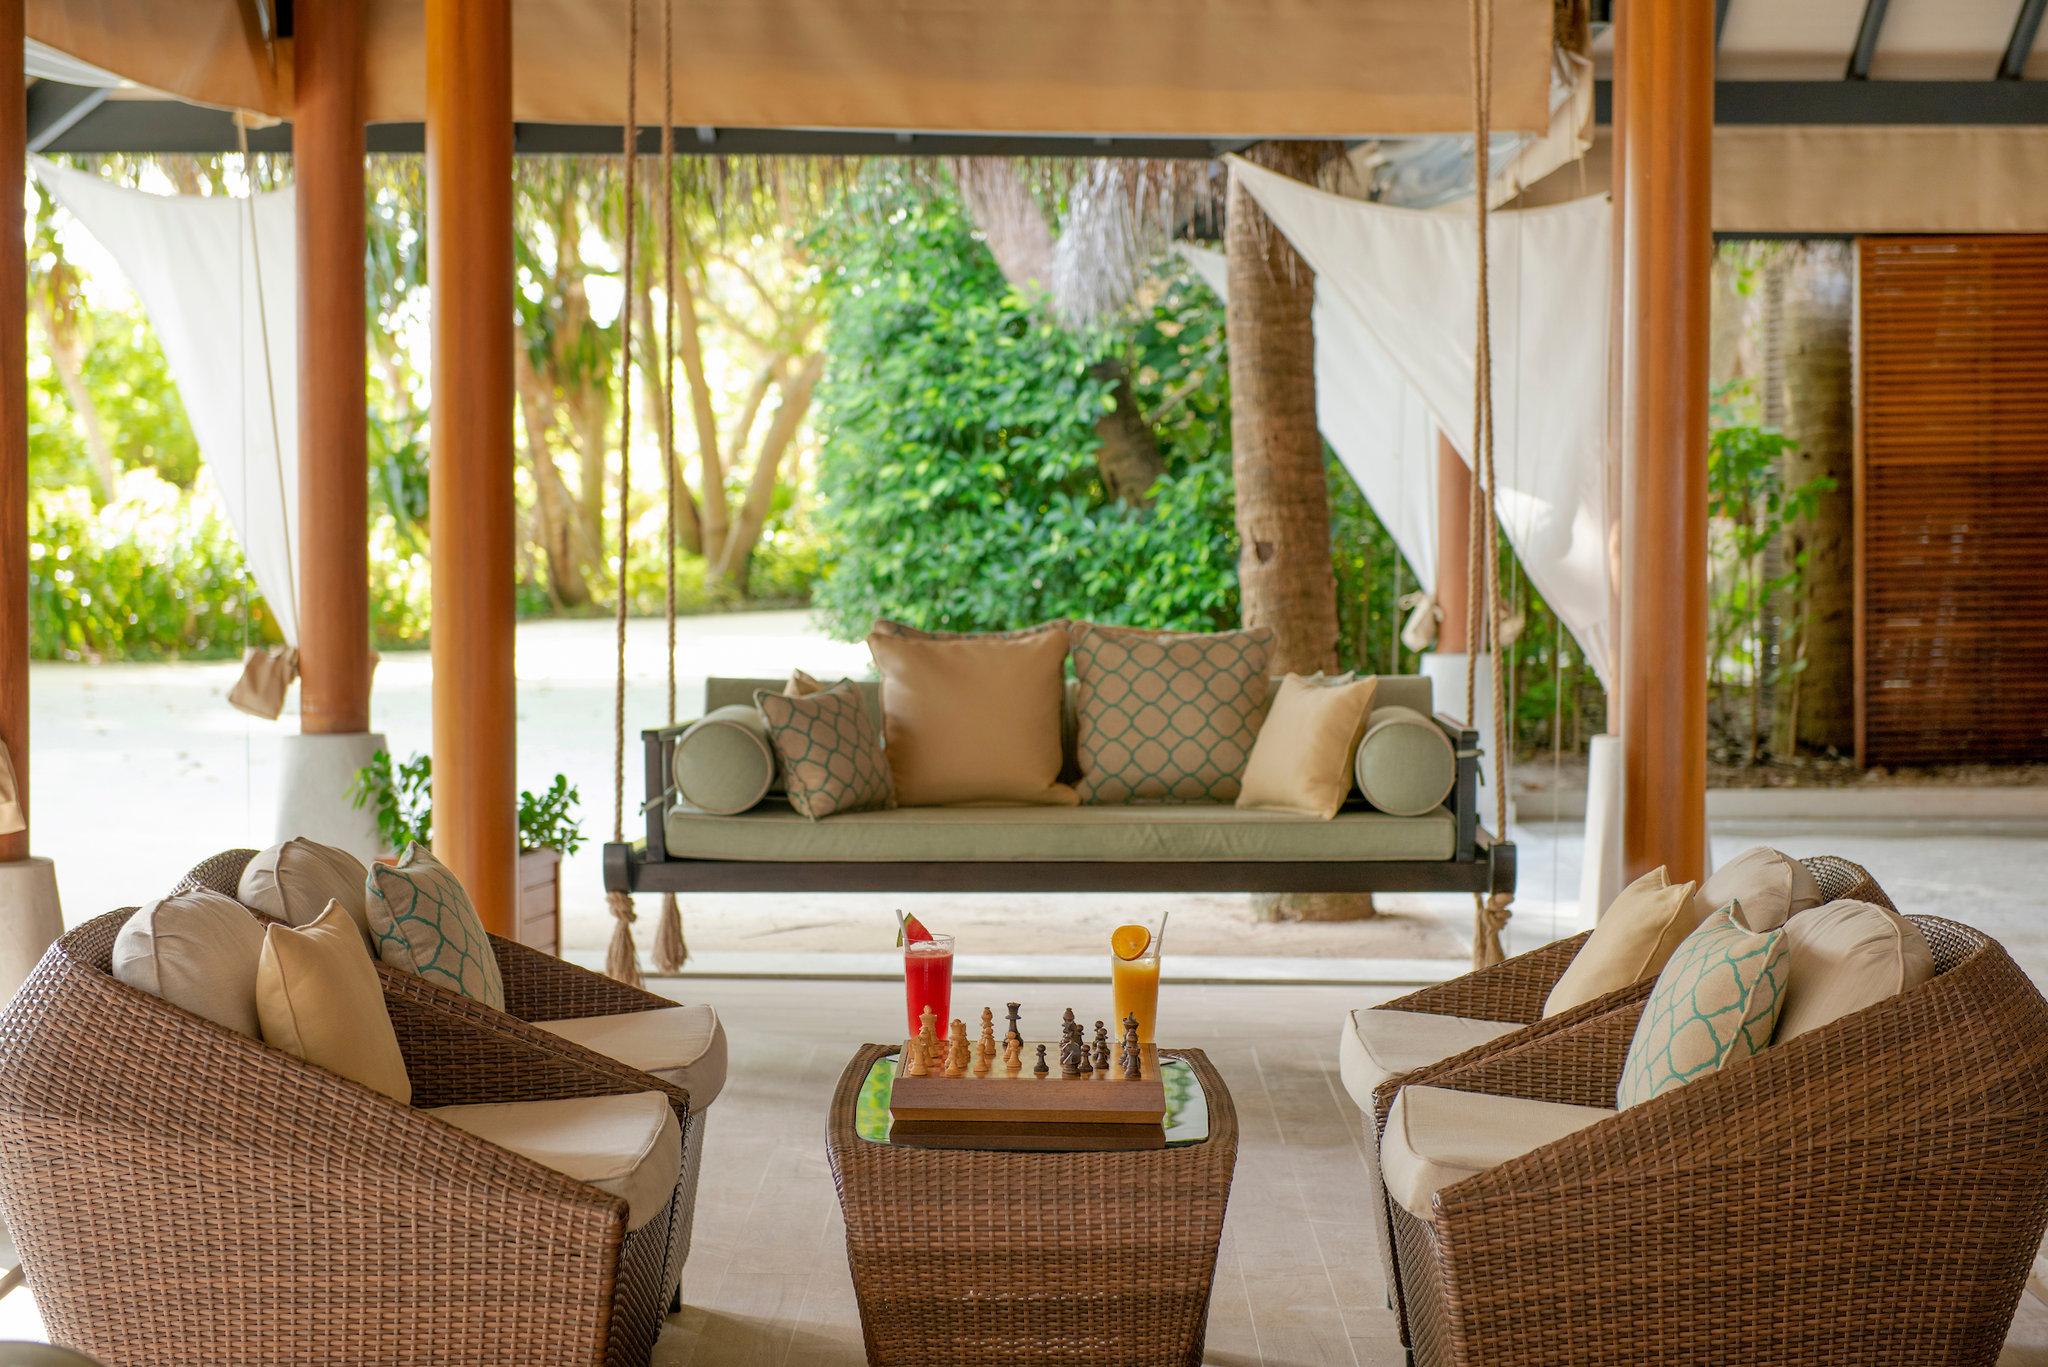 Baros_Maldives_Sails_Bar_Lounge_S.jpg